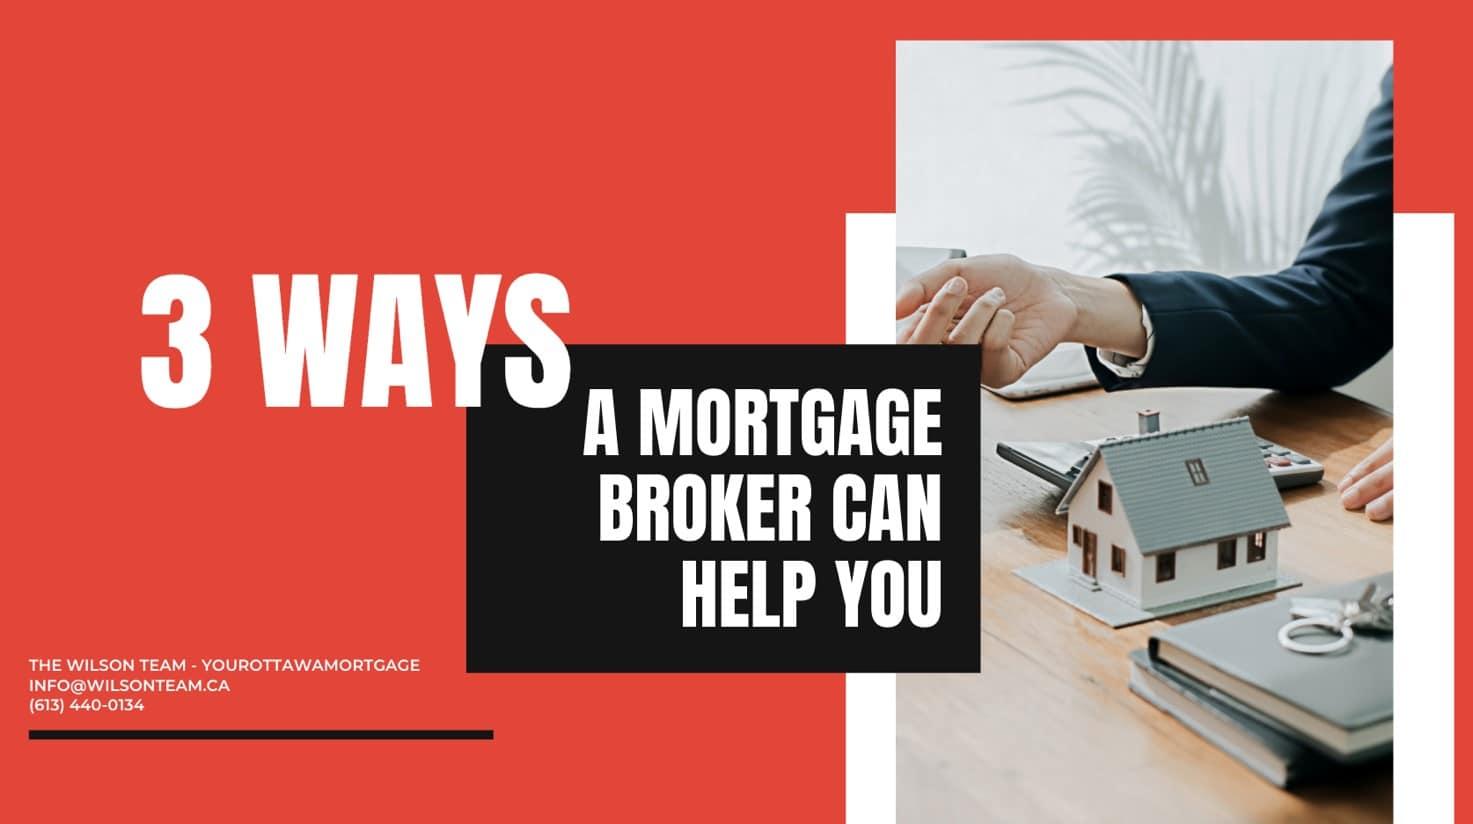 Ottawa Mortgage Broker | 3 Ways a Mortgage Broker Can Help